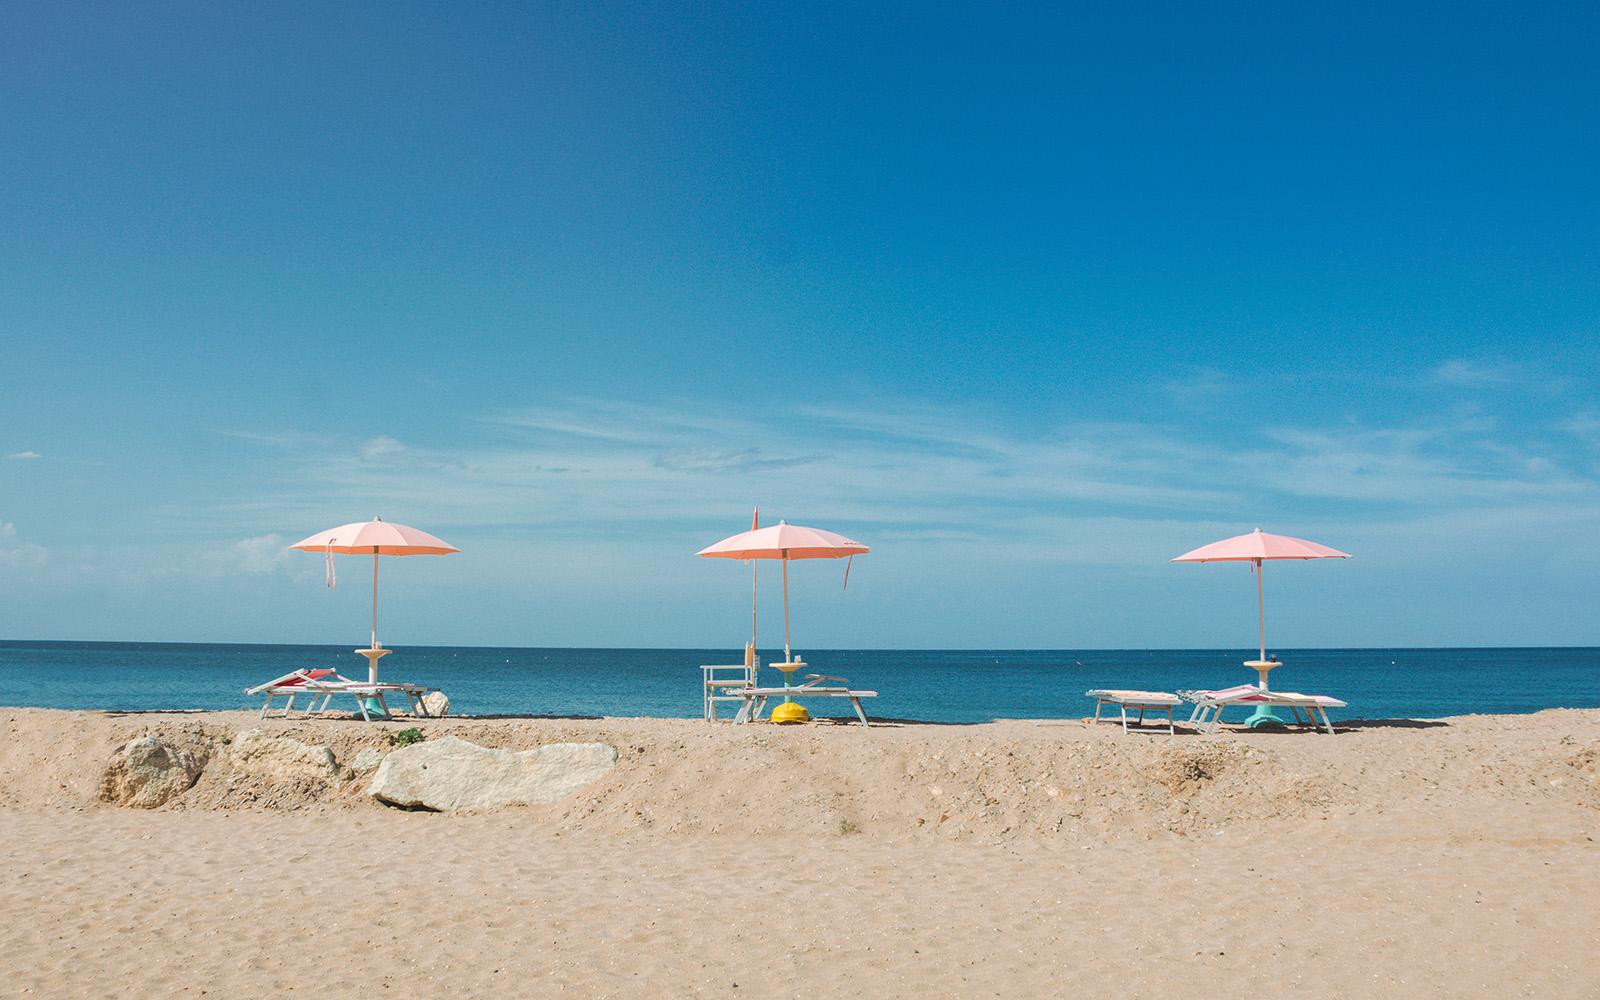 three pink sun umbrellas lined up on the beach